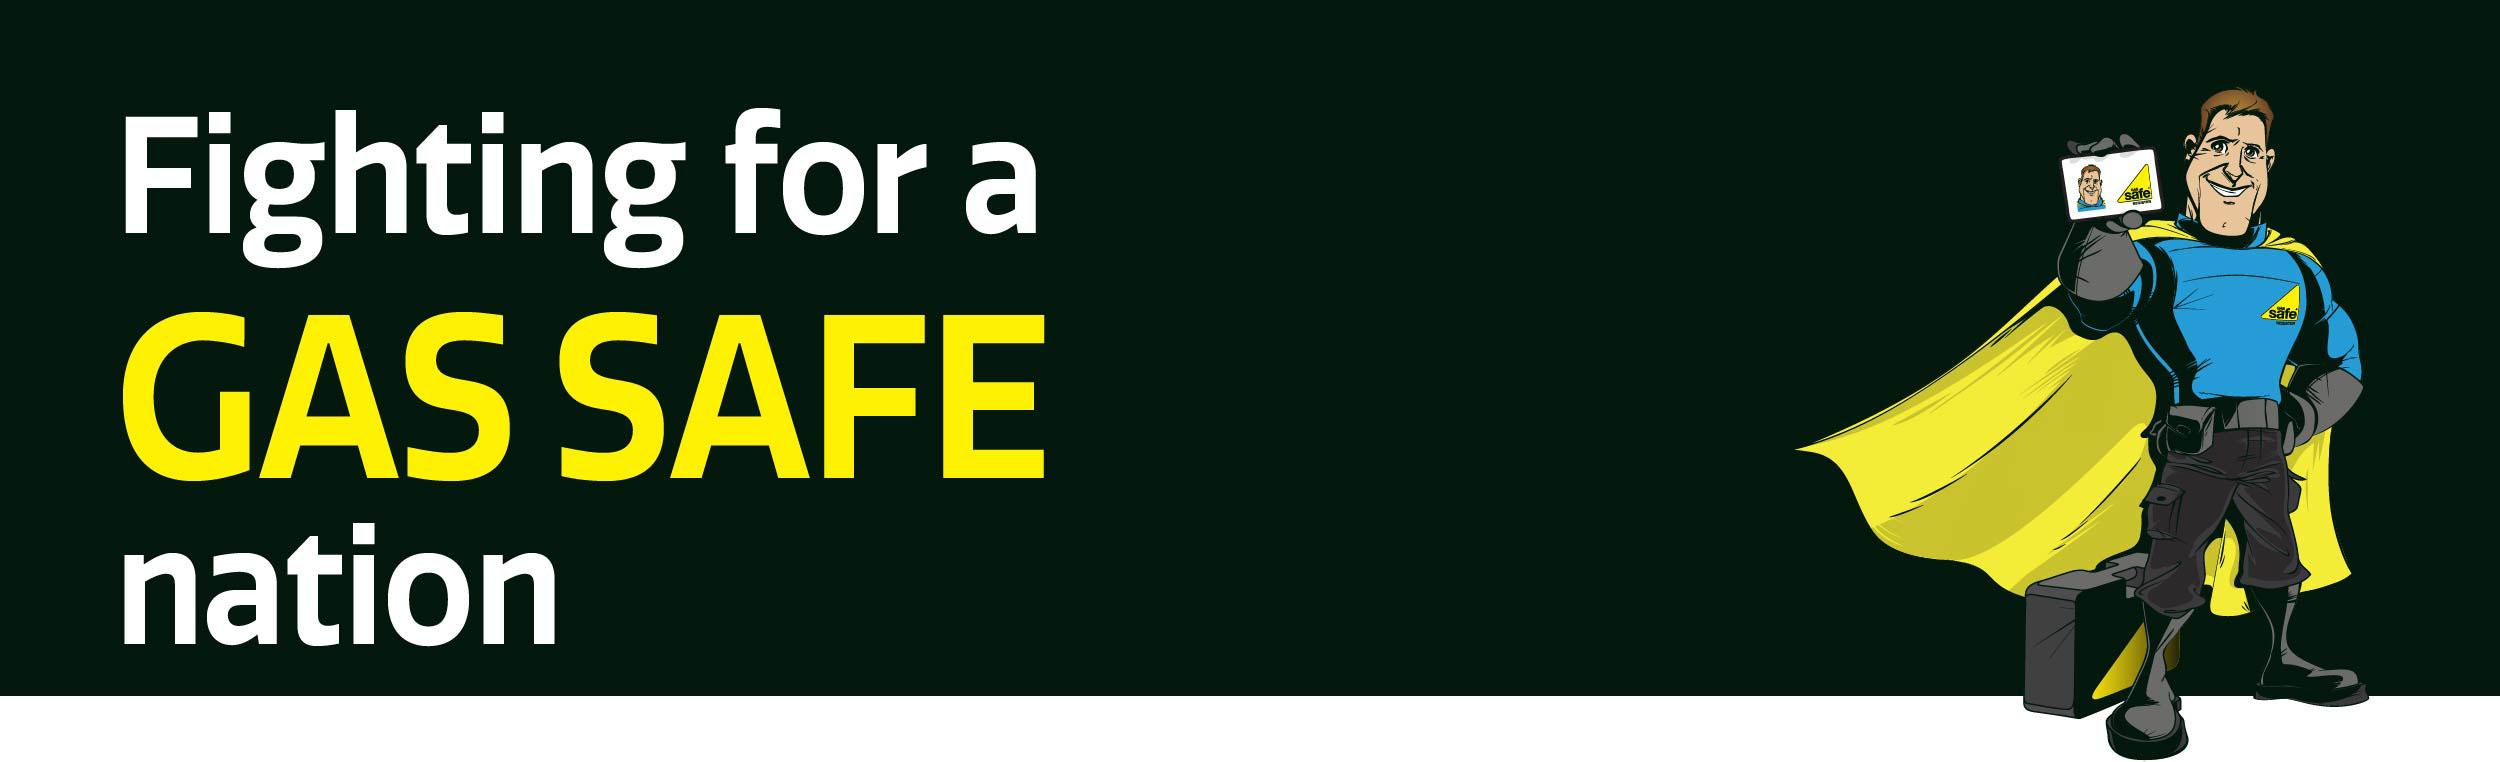 https://jjsgasandheating.co.uk/wp-content/uploads/2020/05/Gas-safety-banner.jpg